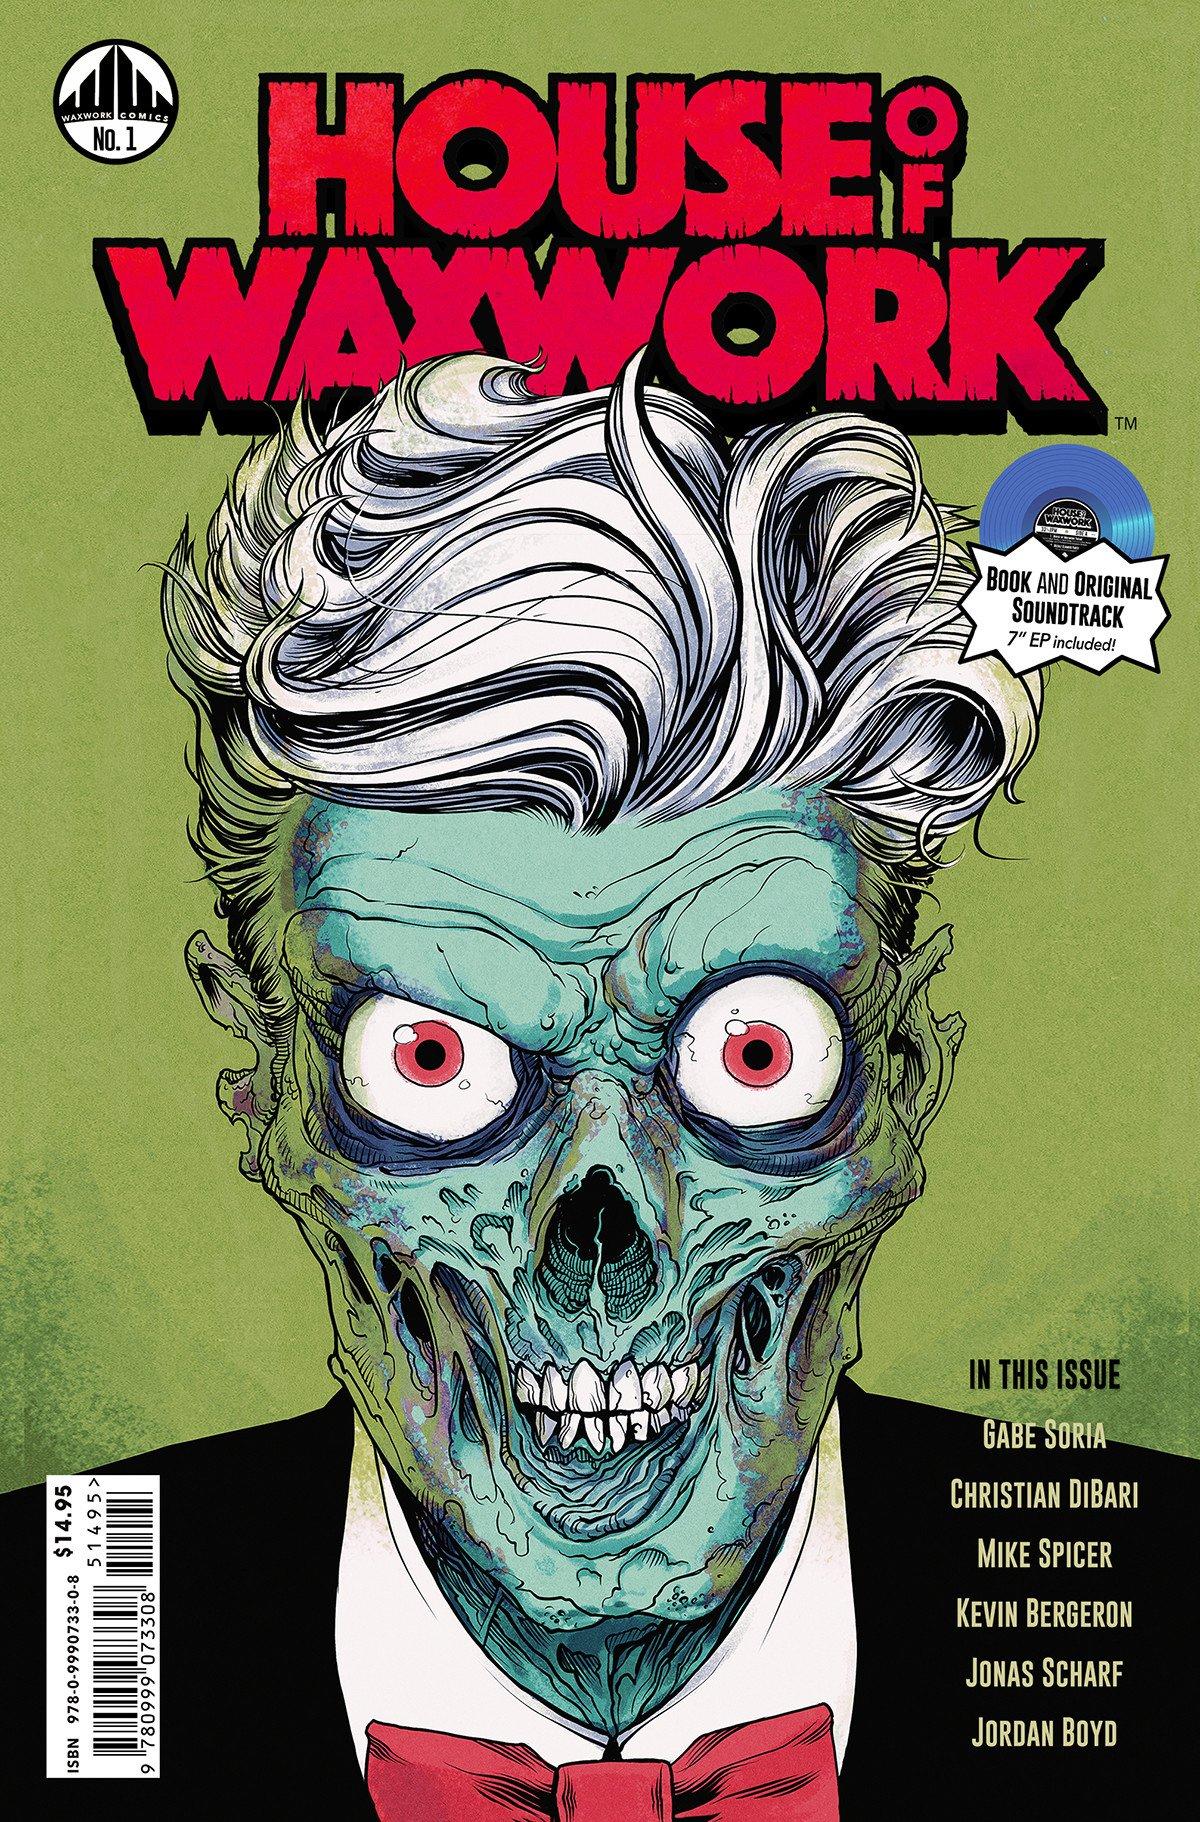 Waxwork Comics Presents HOUSE OF WAXWORK Issue #1